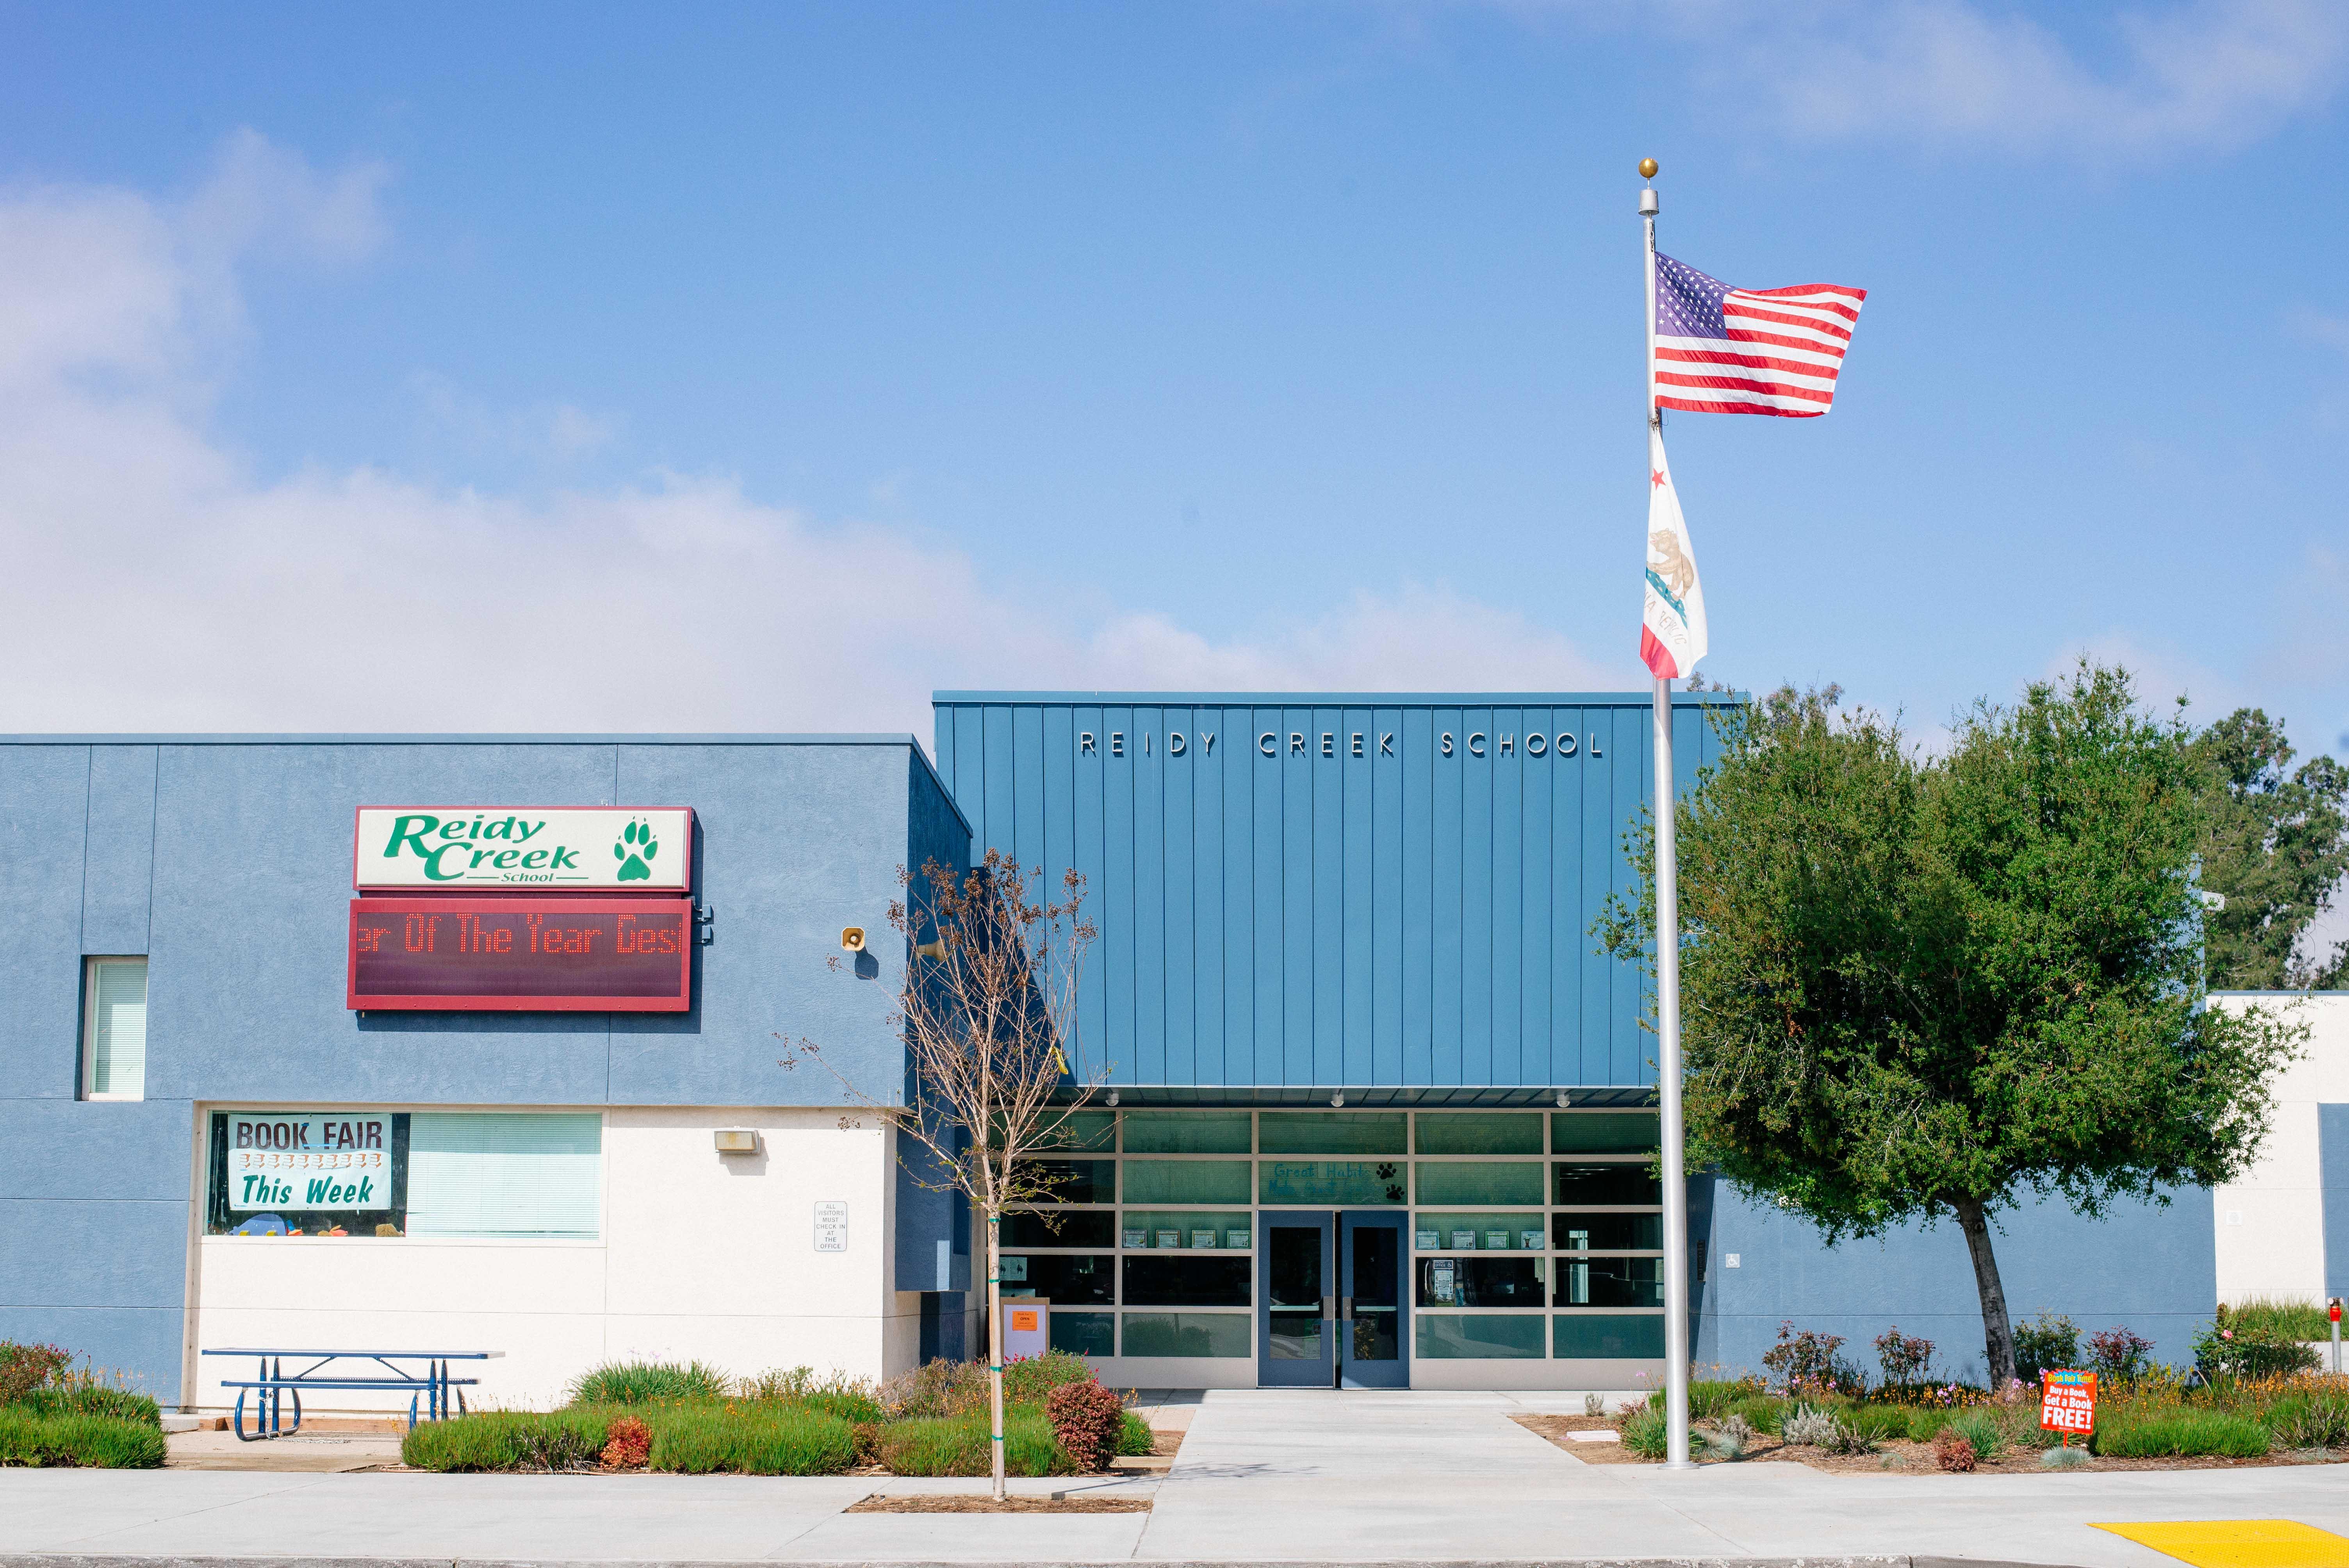 Reidy Creek Elementary